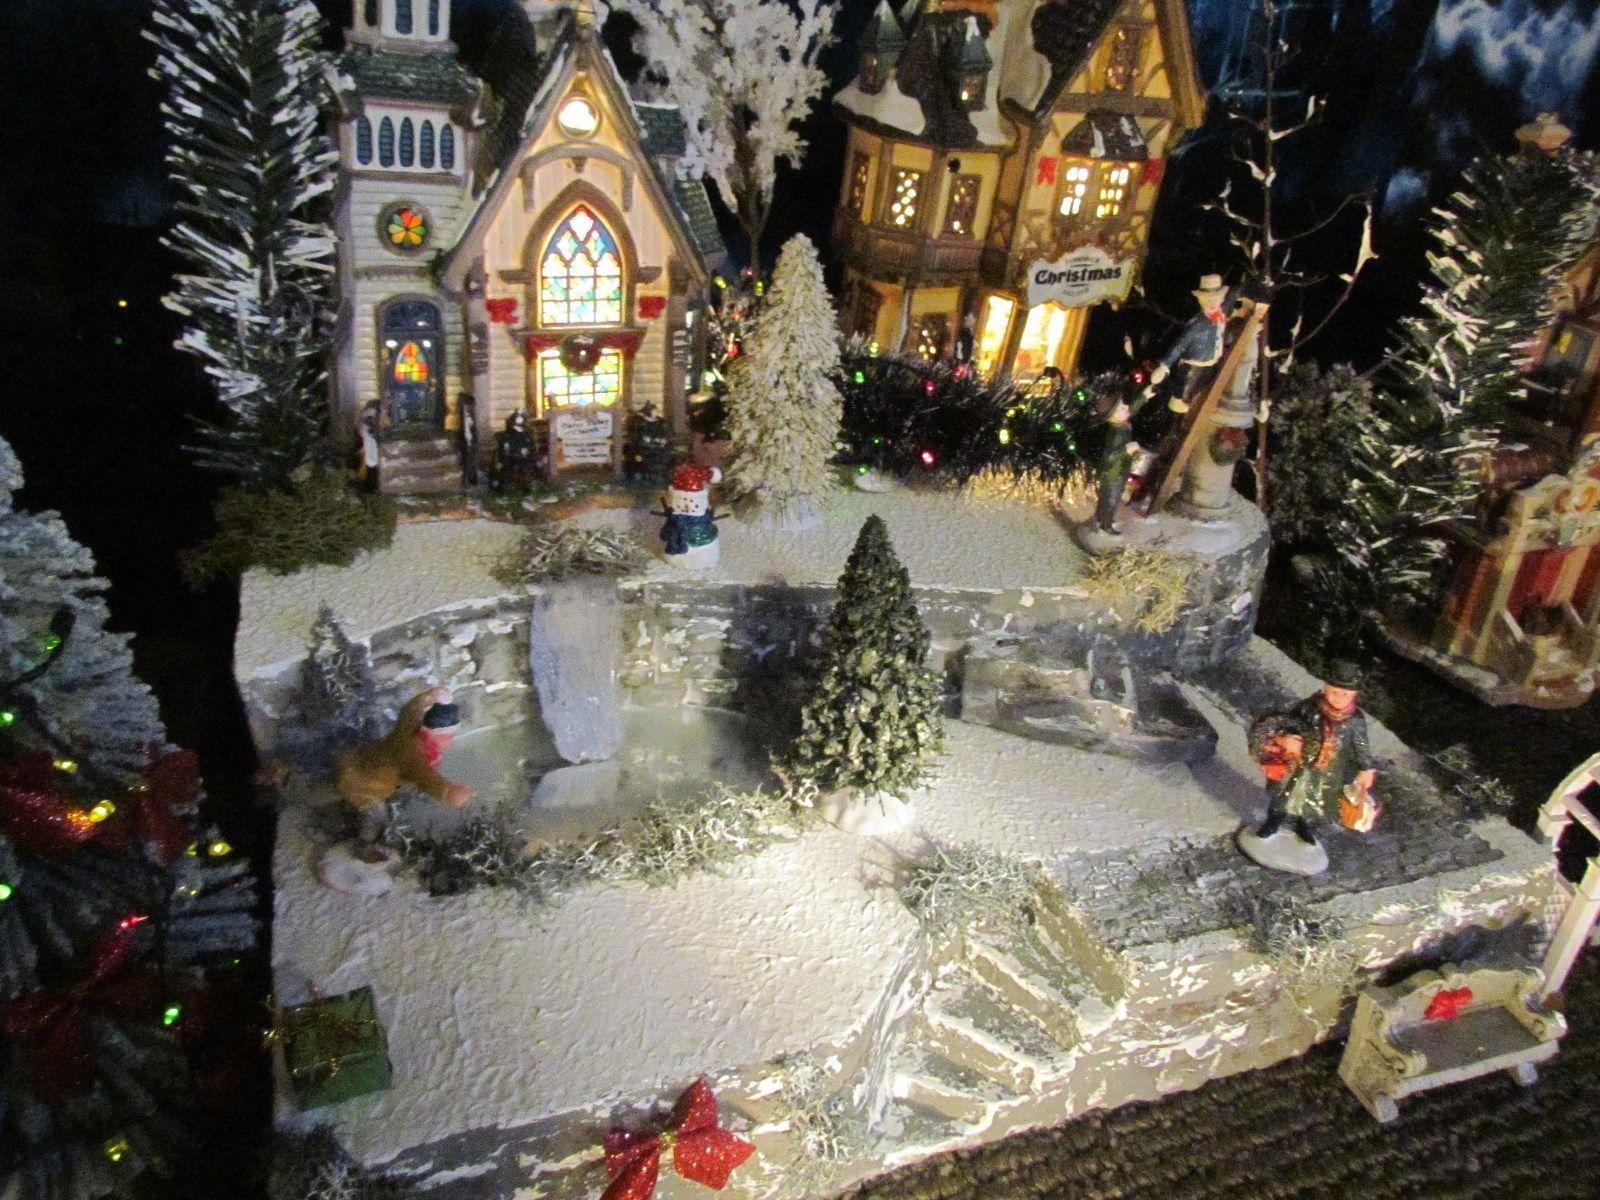 Christmas Village Platforms For Sale.Pin On Villagedisplays Com Buy Department 56 Display